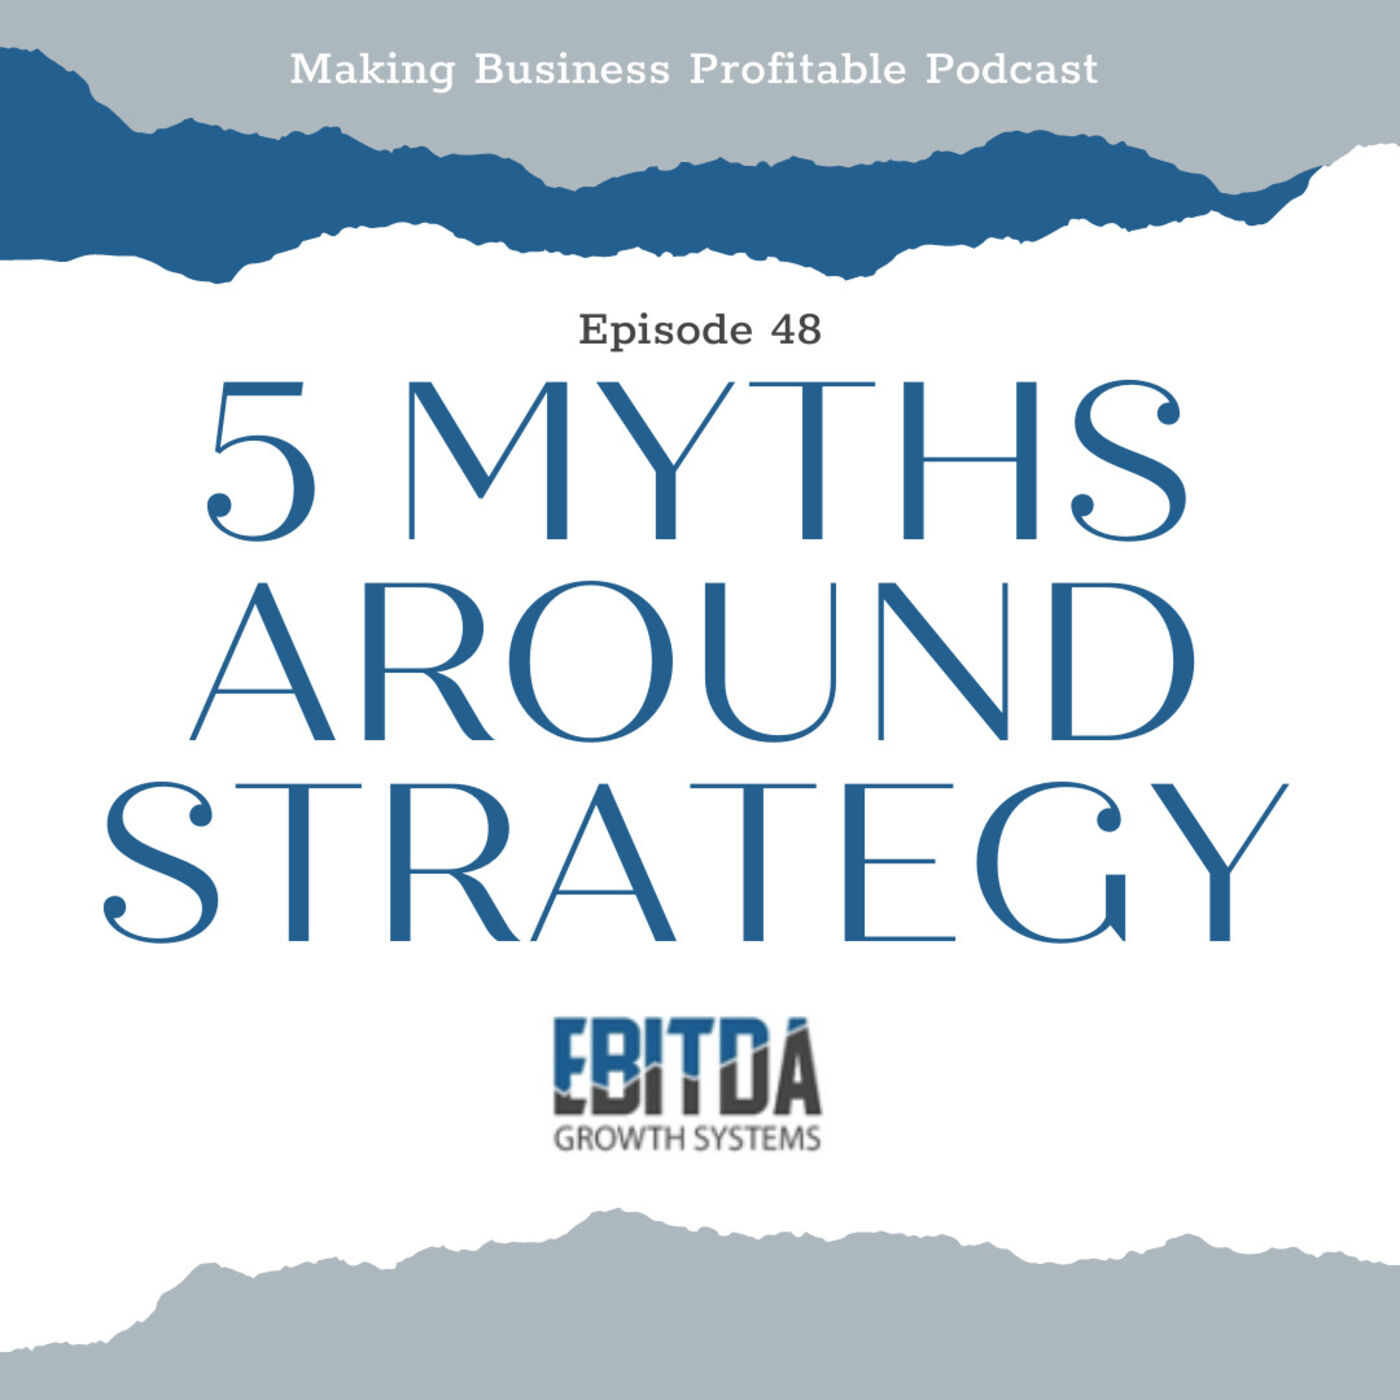 Episode 48 - 5 Myths around Strategy